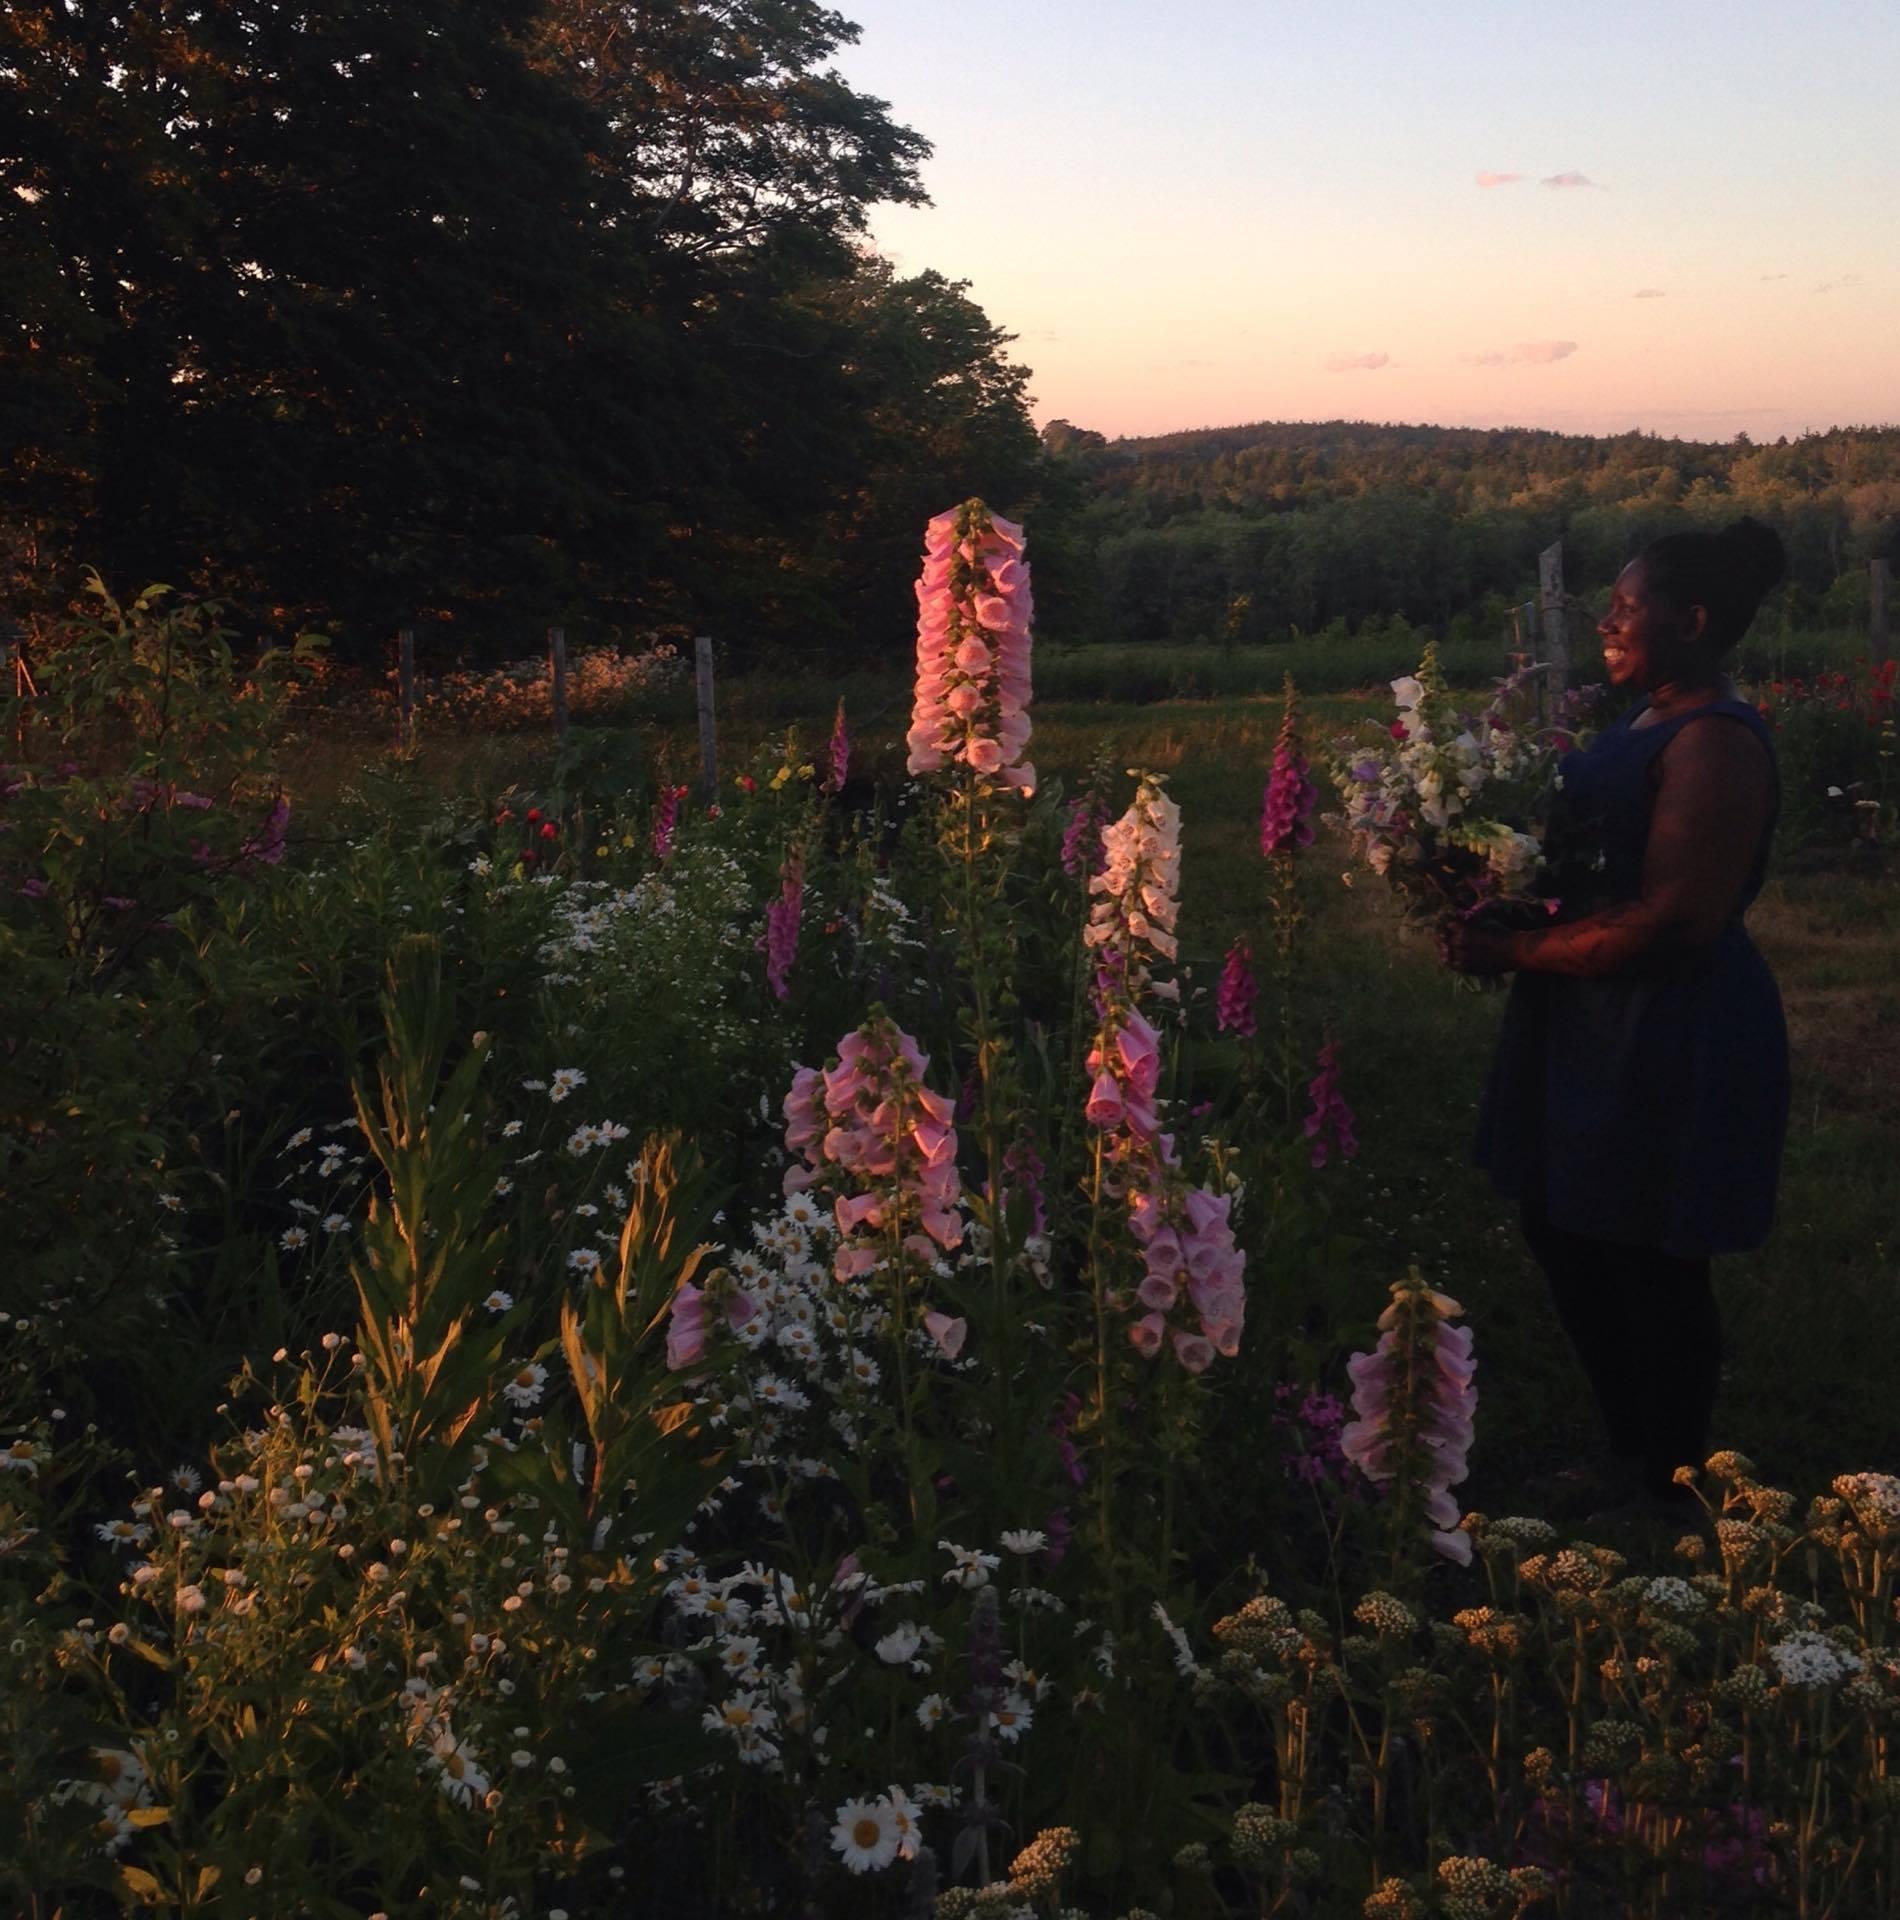 Halifax, Nova Scotia's bouquet subscription / flower CSA